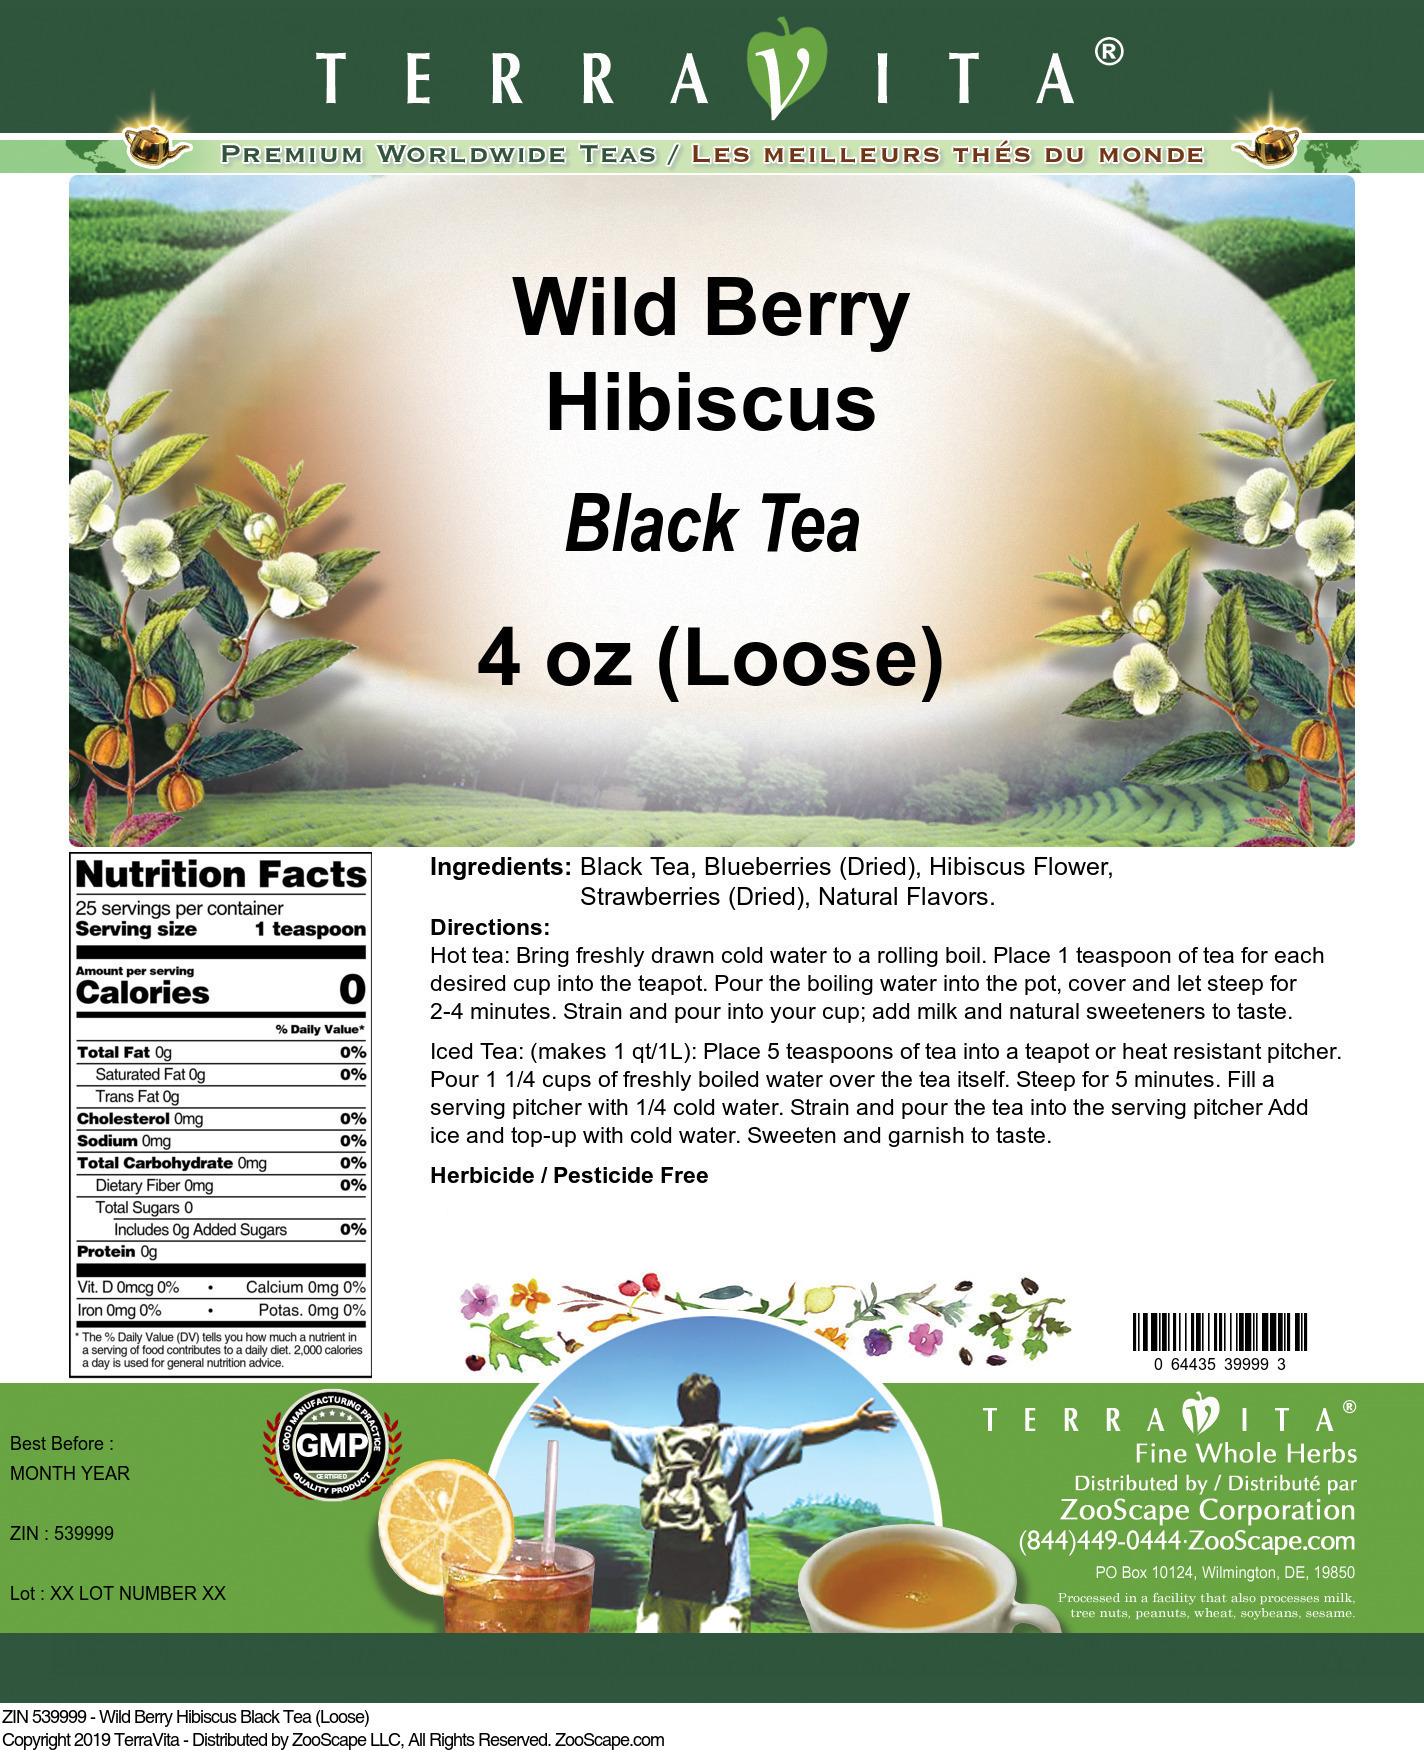 Wild Berry Hibiscus Black Tea (Loose)